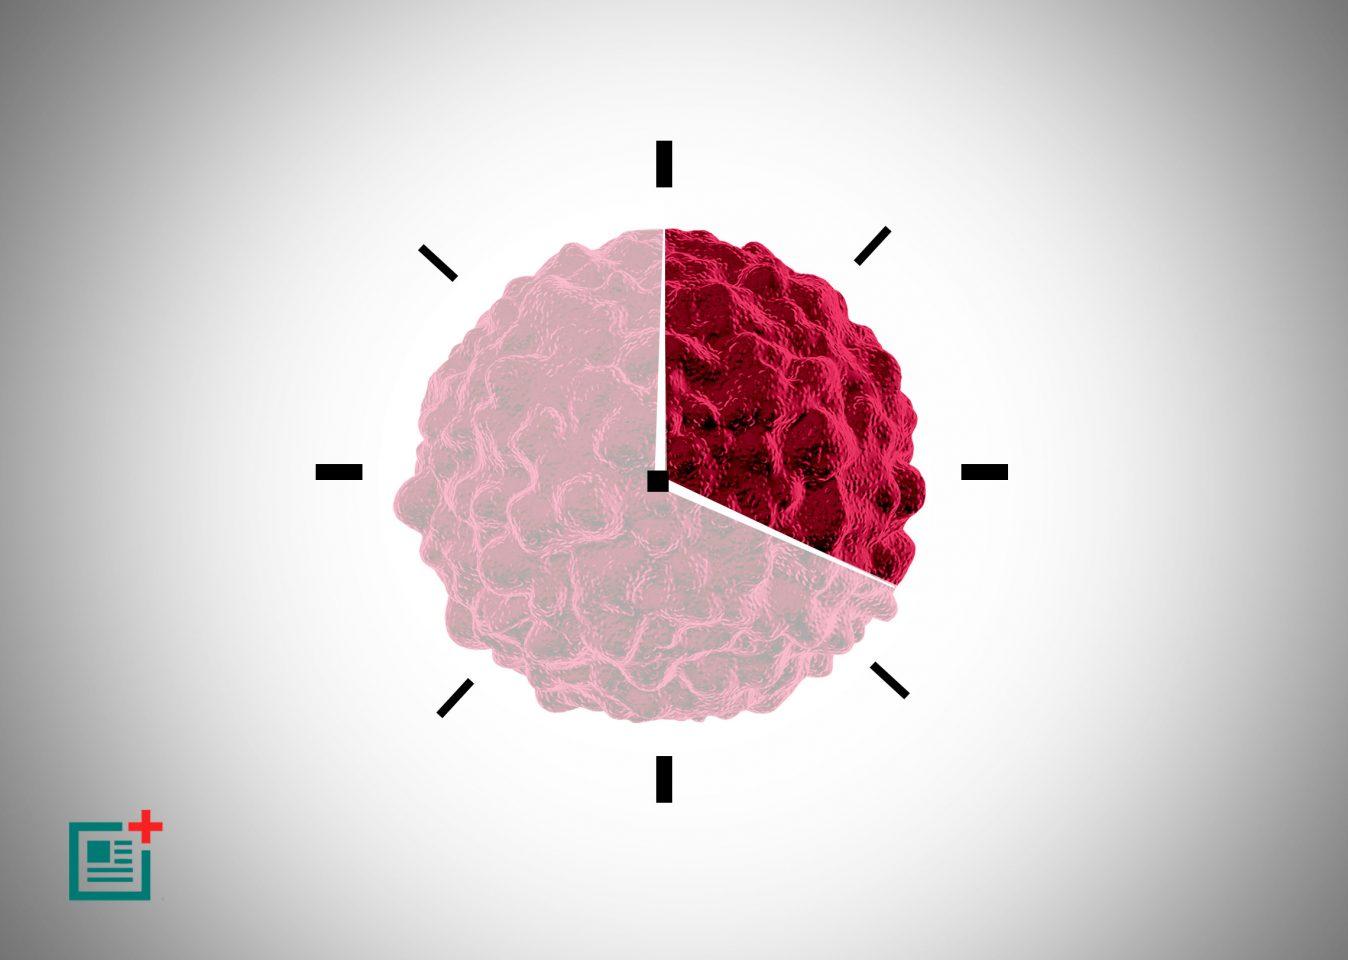 Patients Wait 4 Months Before Seeking Cancer Treatment